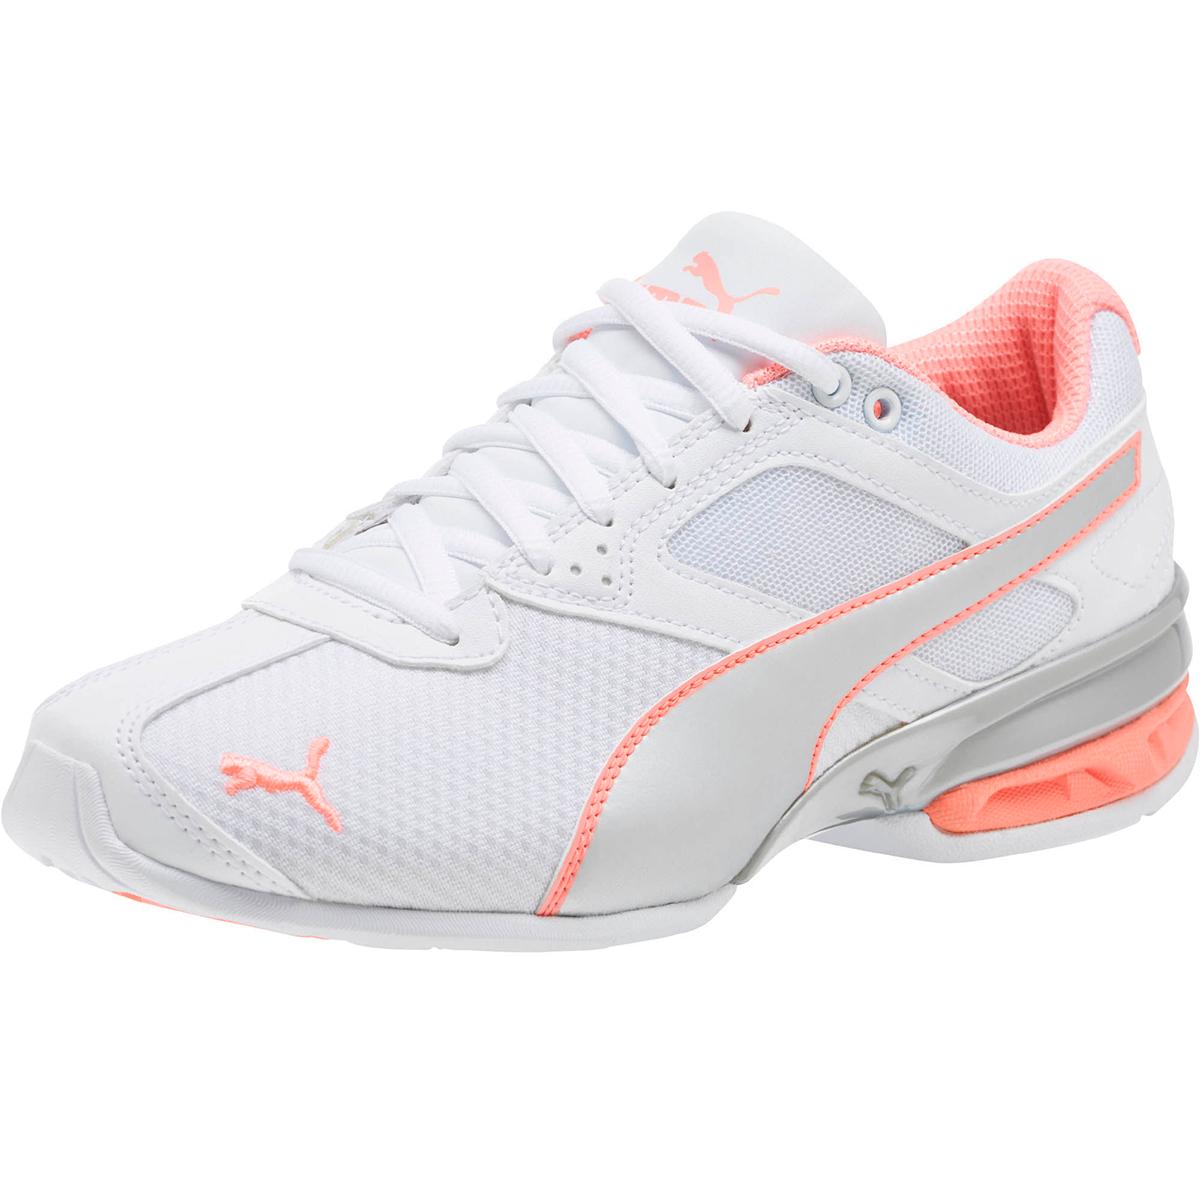 Puma Women's Tazon 6 Metallic Sneakers - White, 7.5